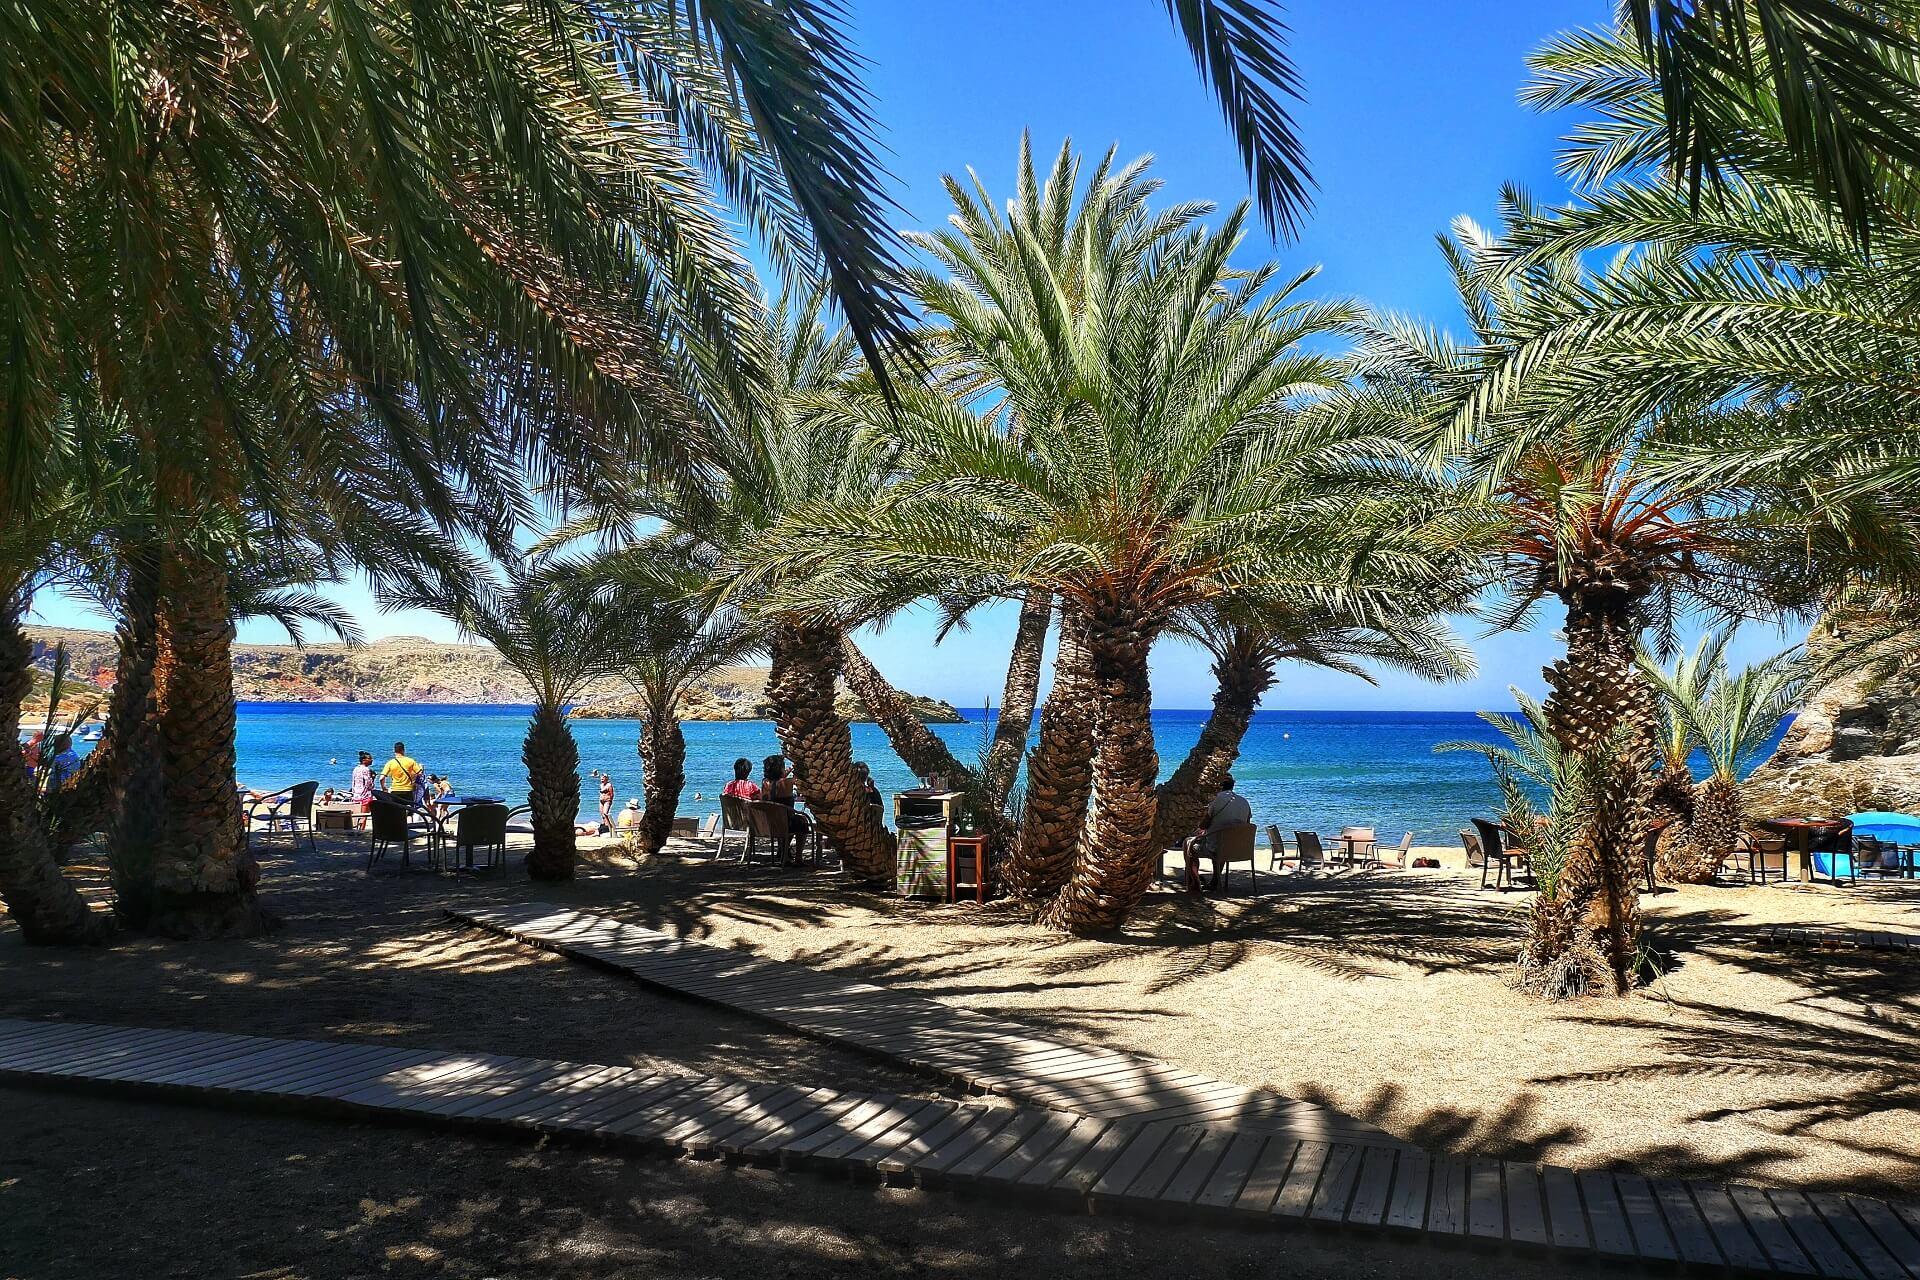 Visit Vai Beach on the Greek Island of Crete